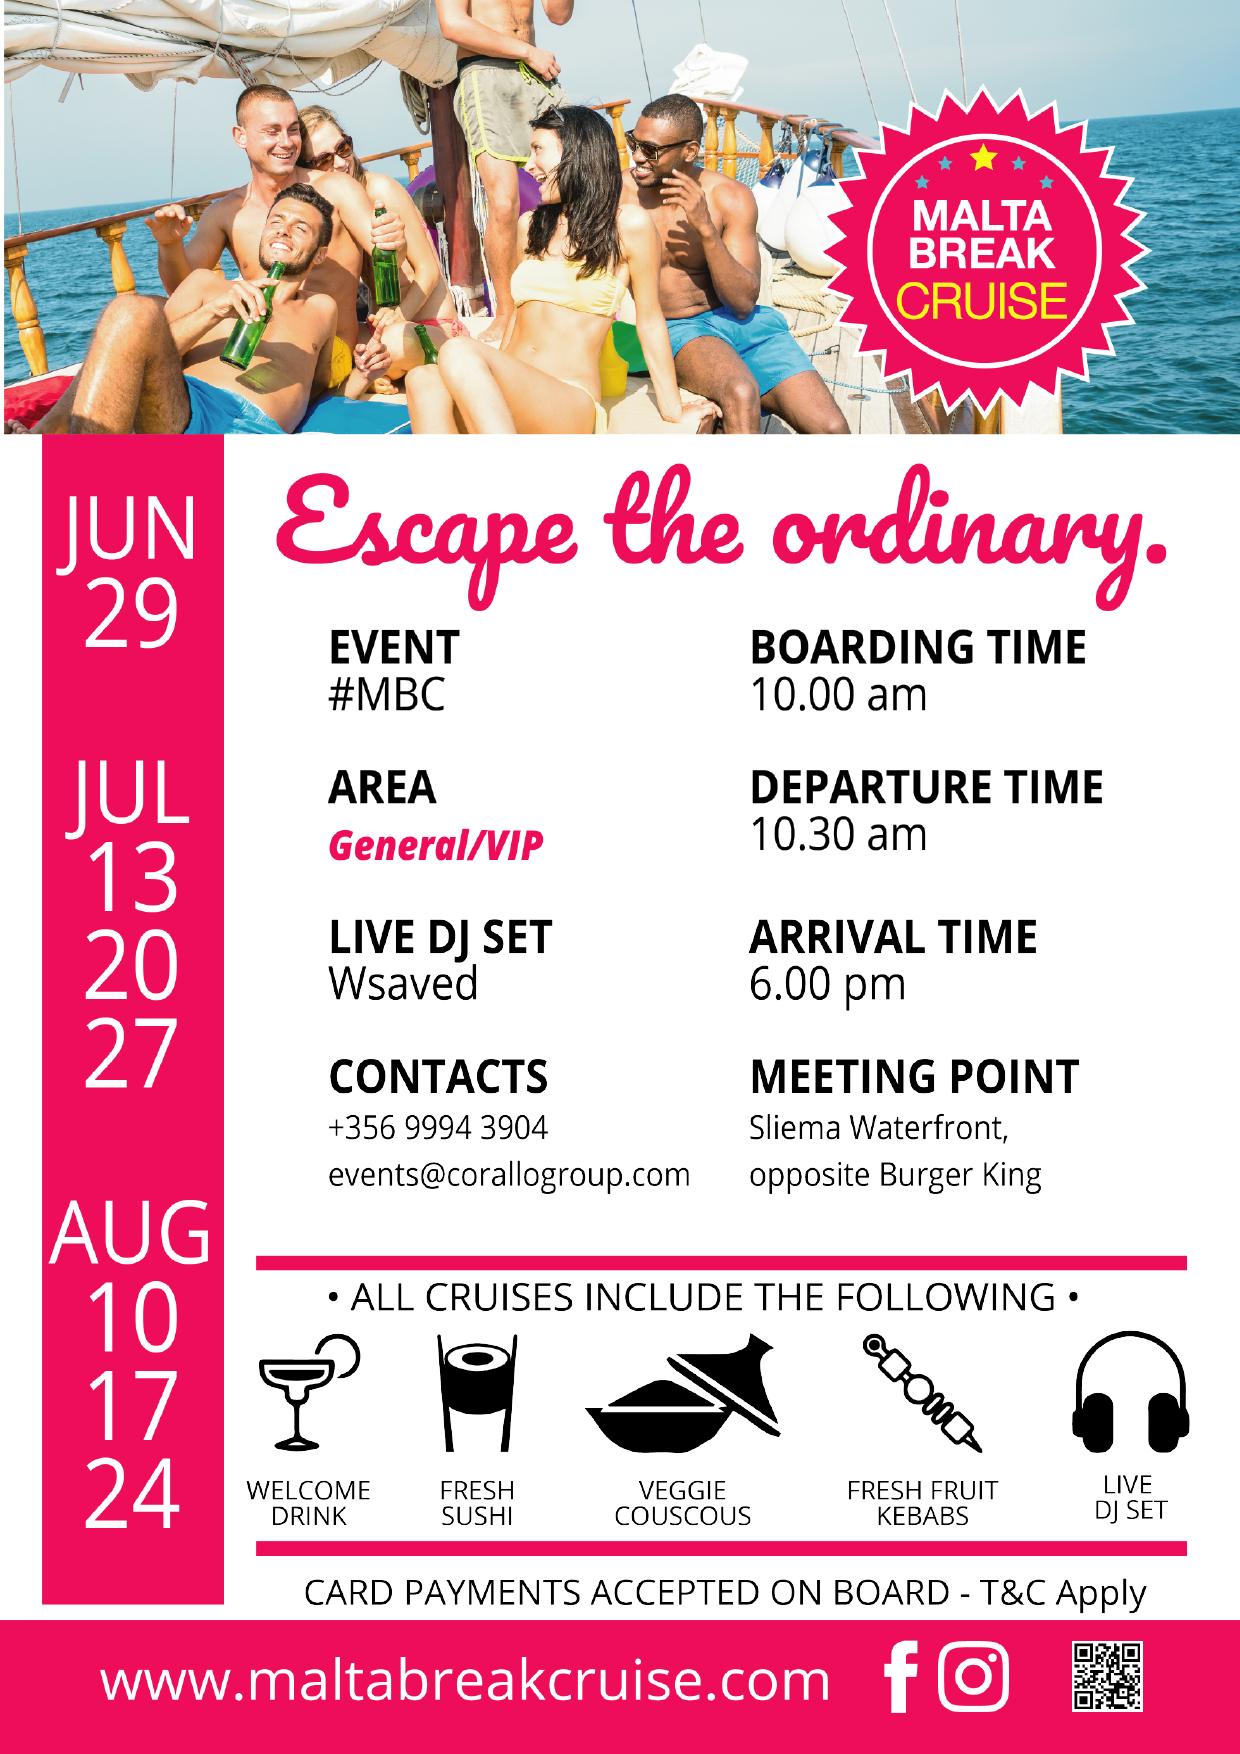 Malta Break Cruise flyer